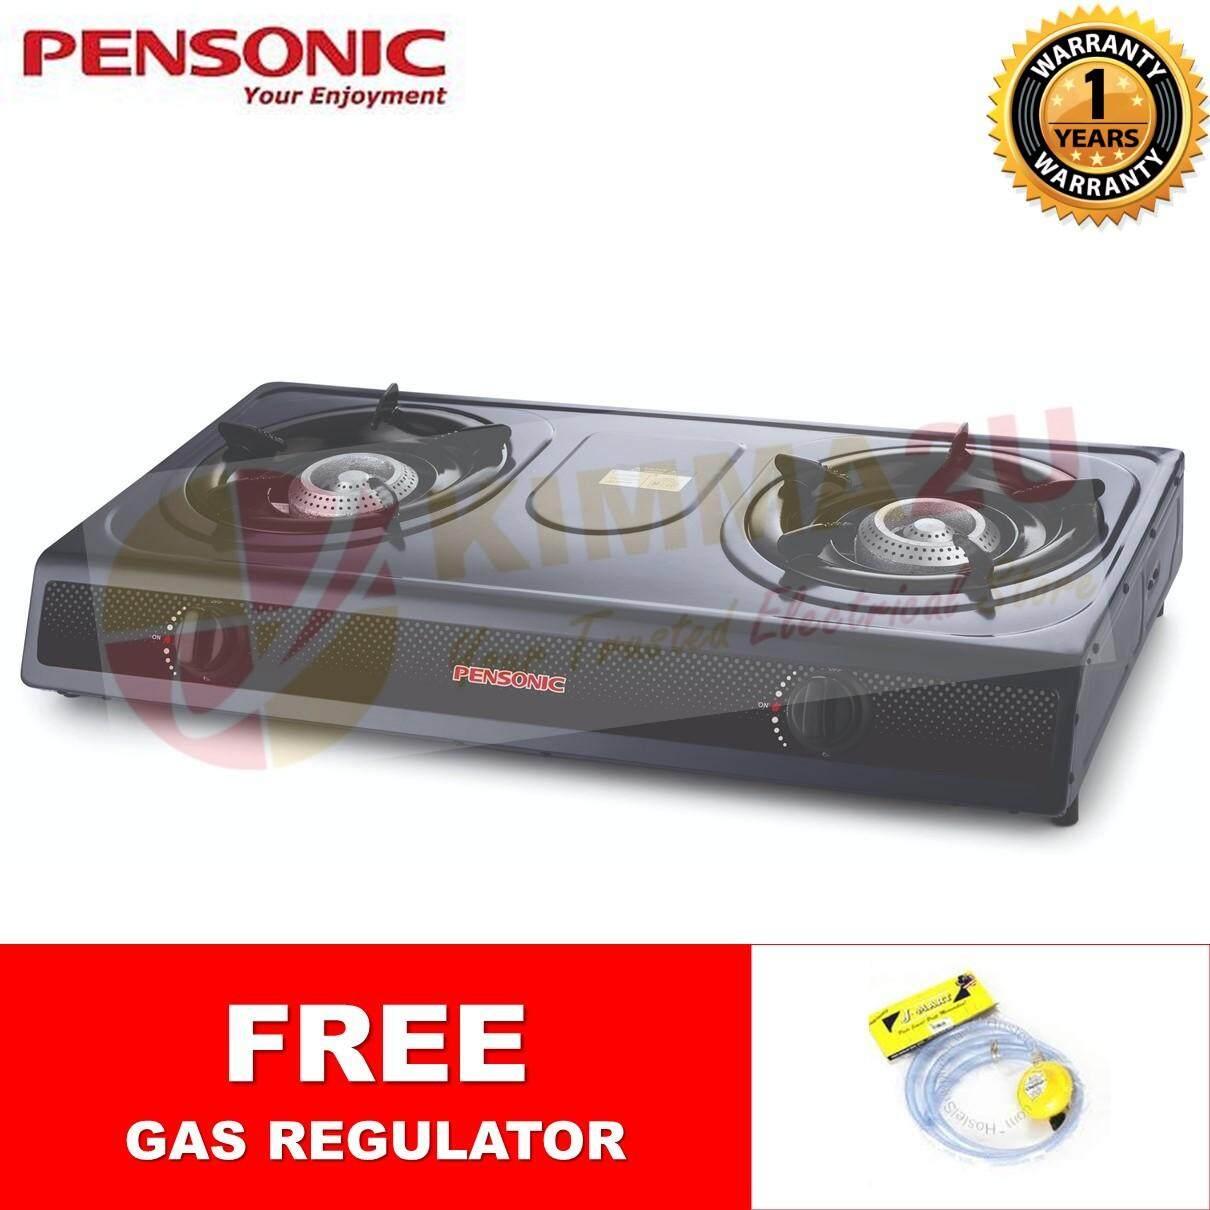 Free Gas Regulator Pensonic Cooker Pgc 26n